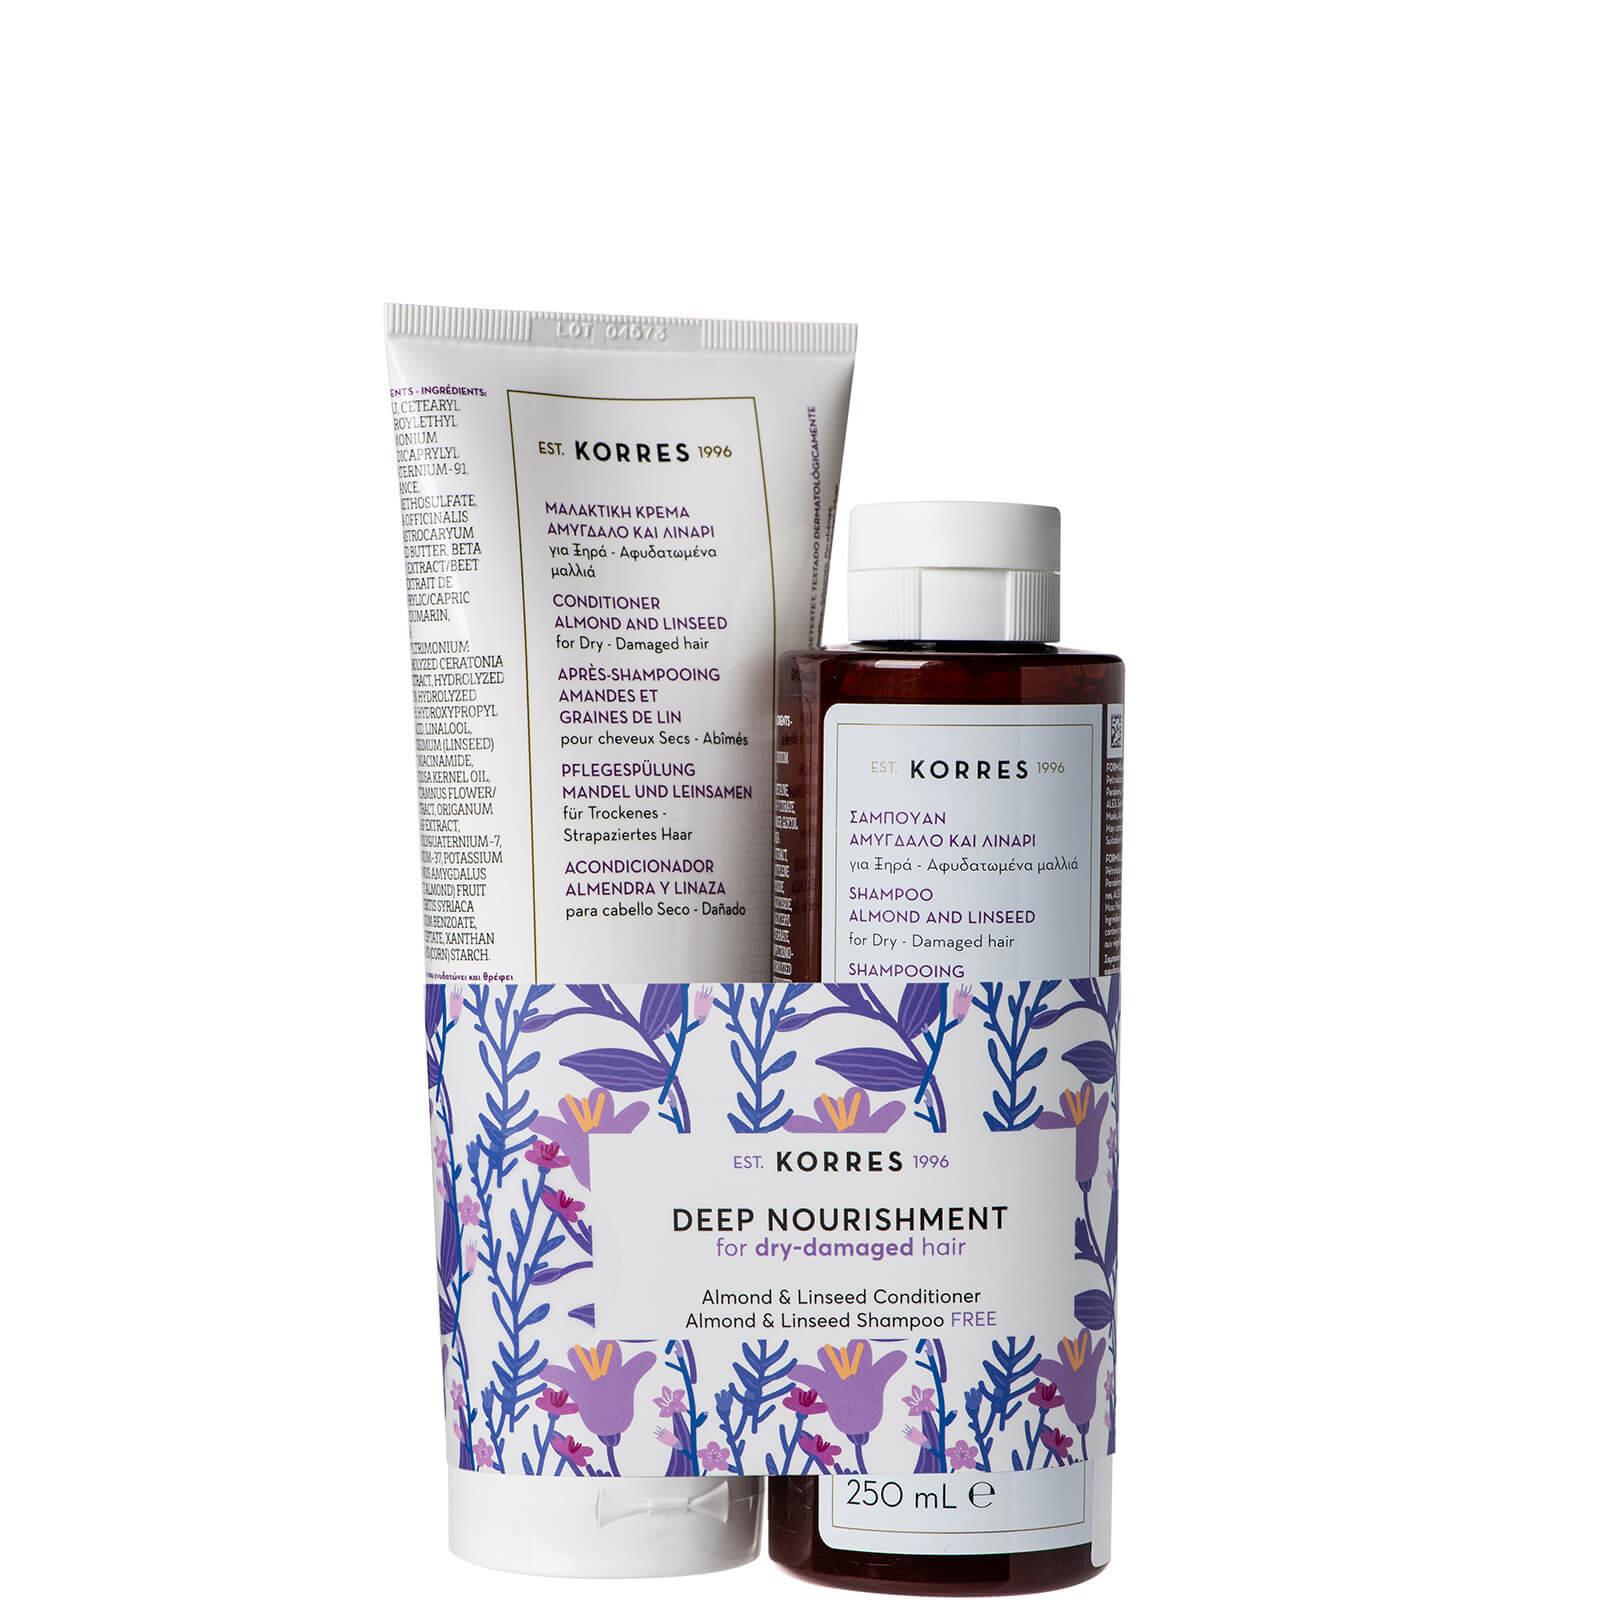 Купить KORRES Almond & Linseed Kit Conditioner and Shampoo Duo